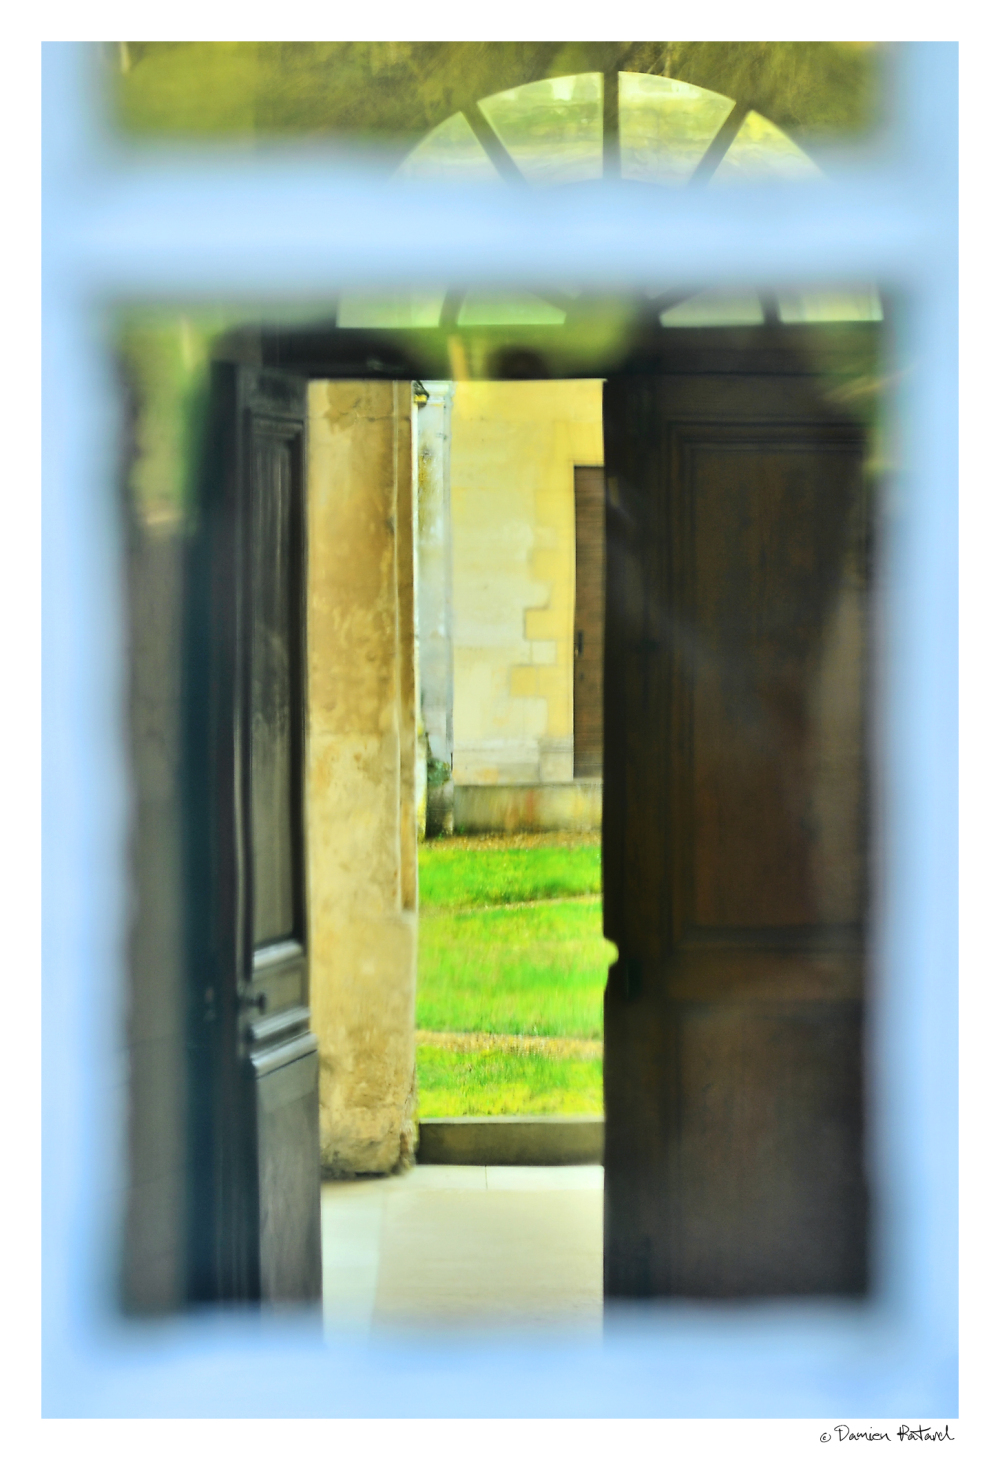 abbaye, bec hellouin, caché derrière